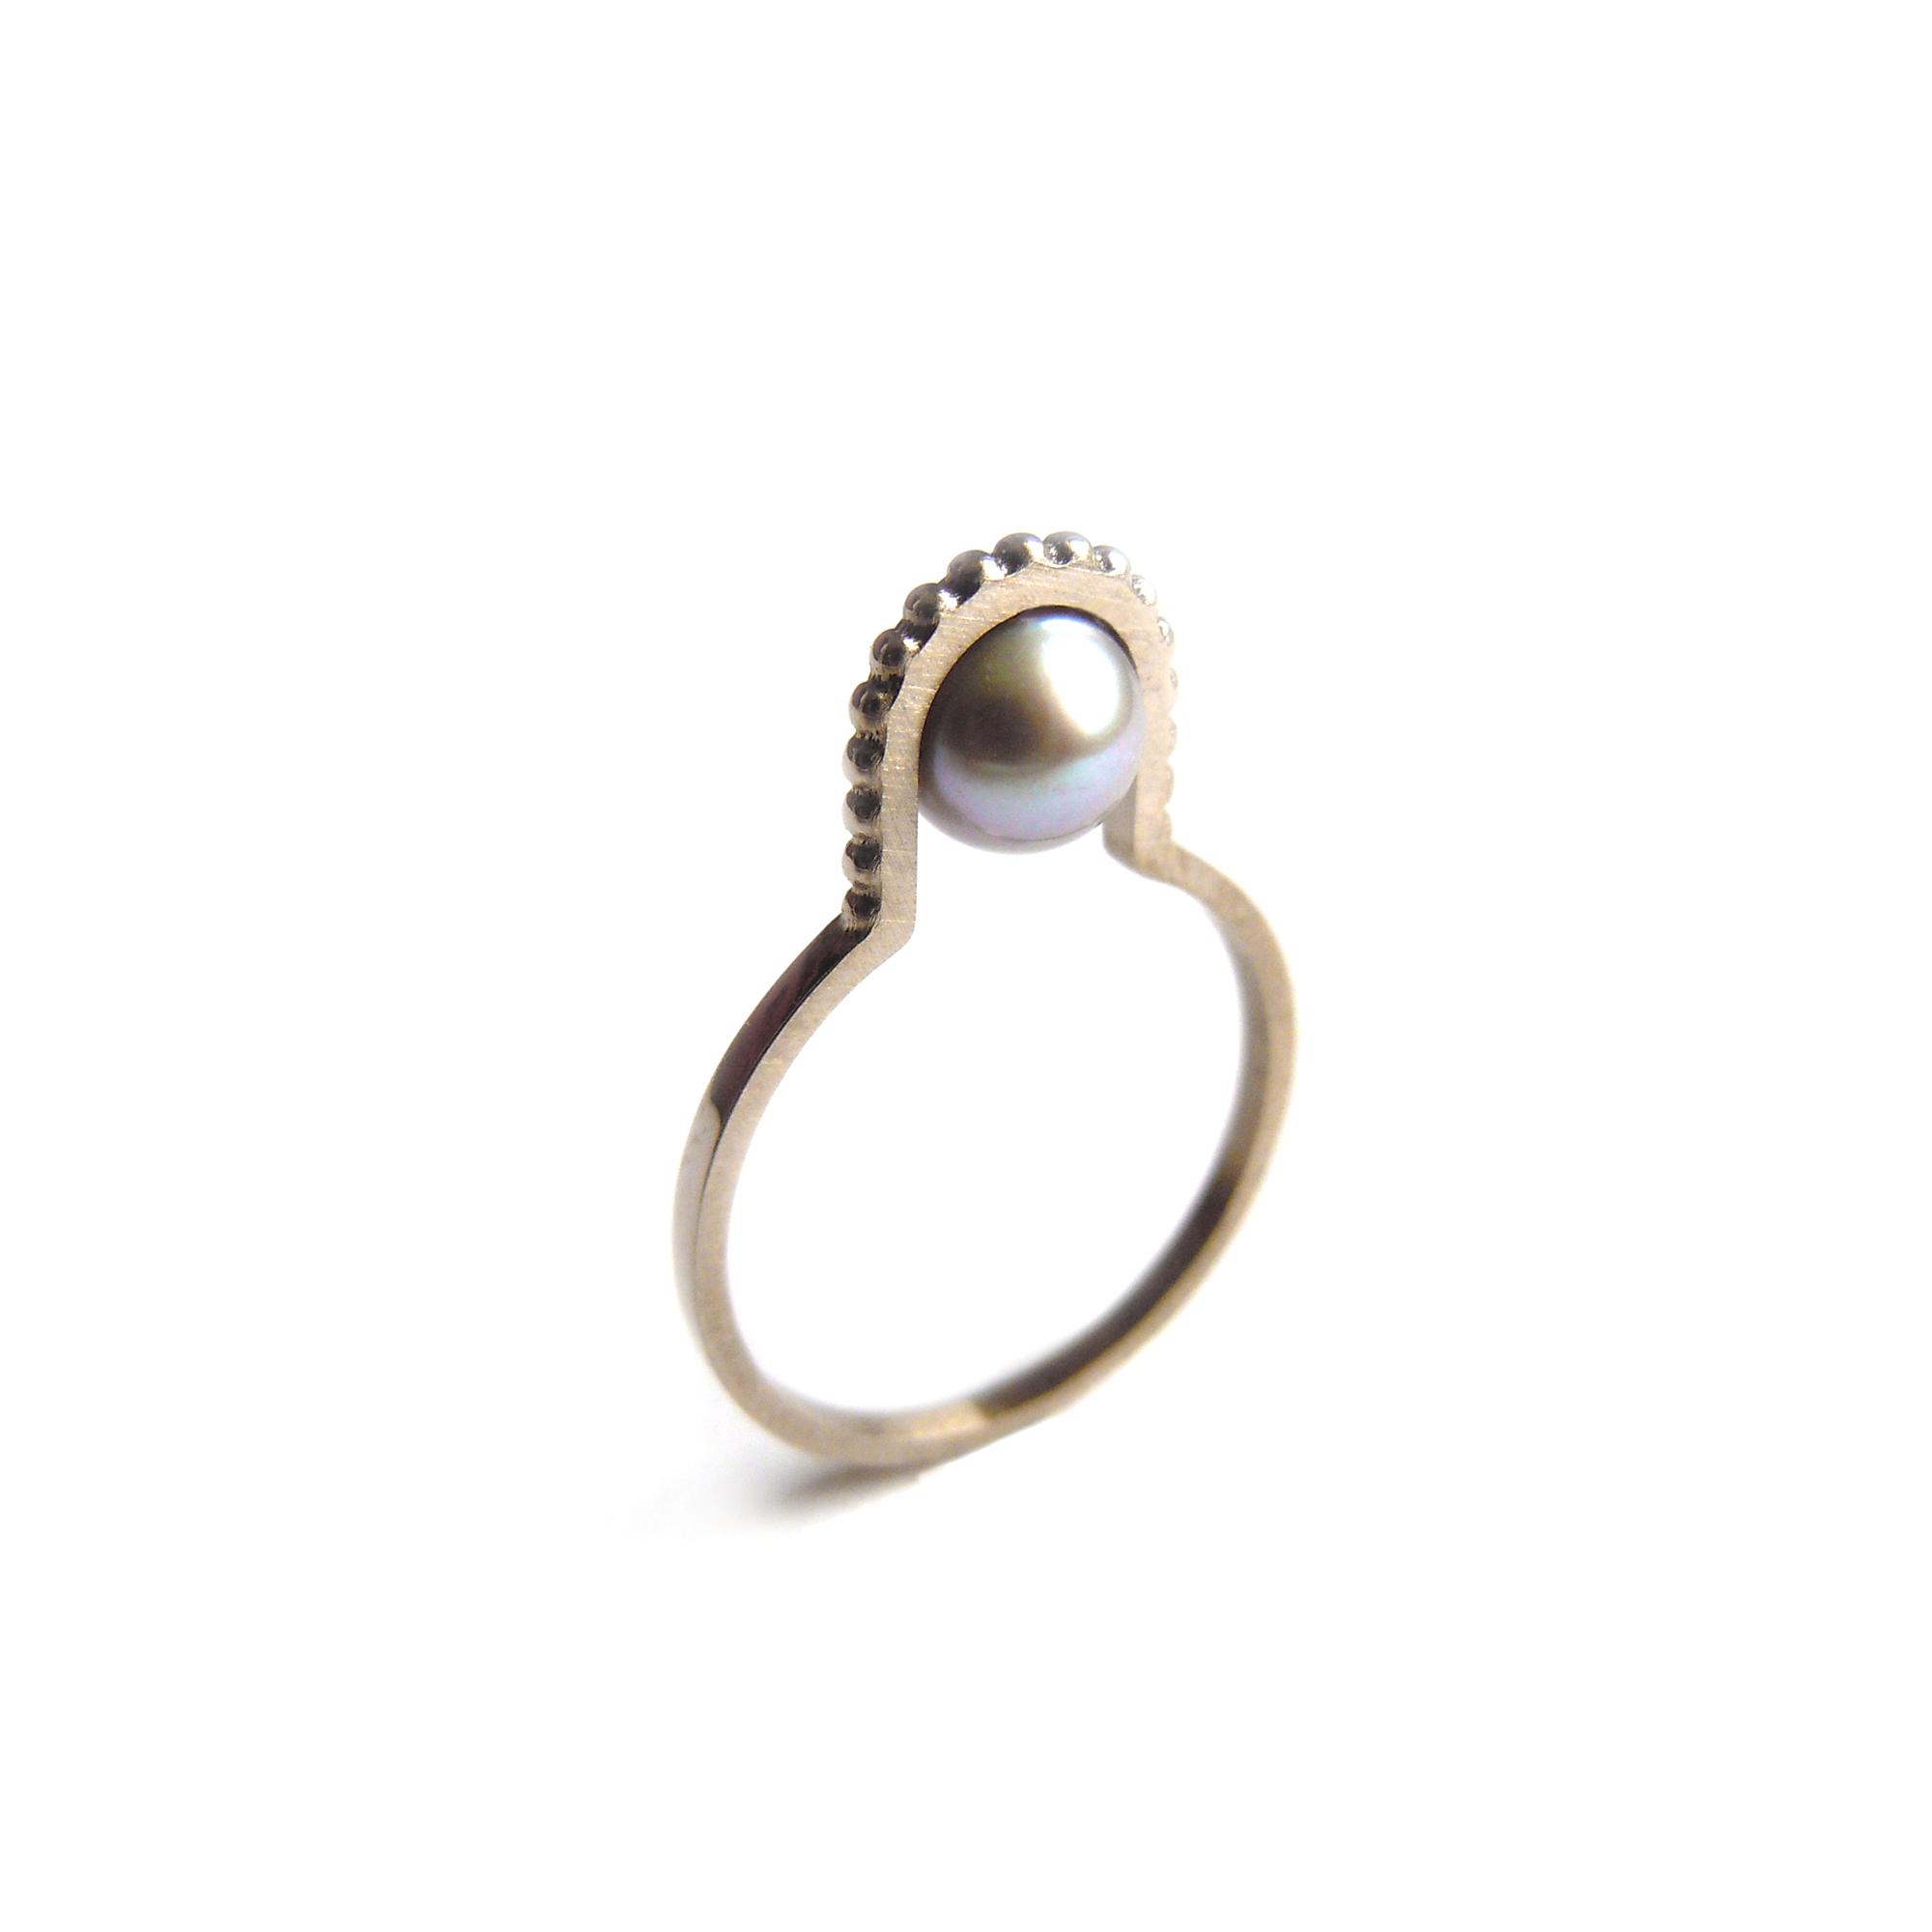 Oxx Jewellery (1).jpg